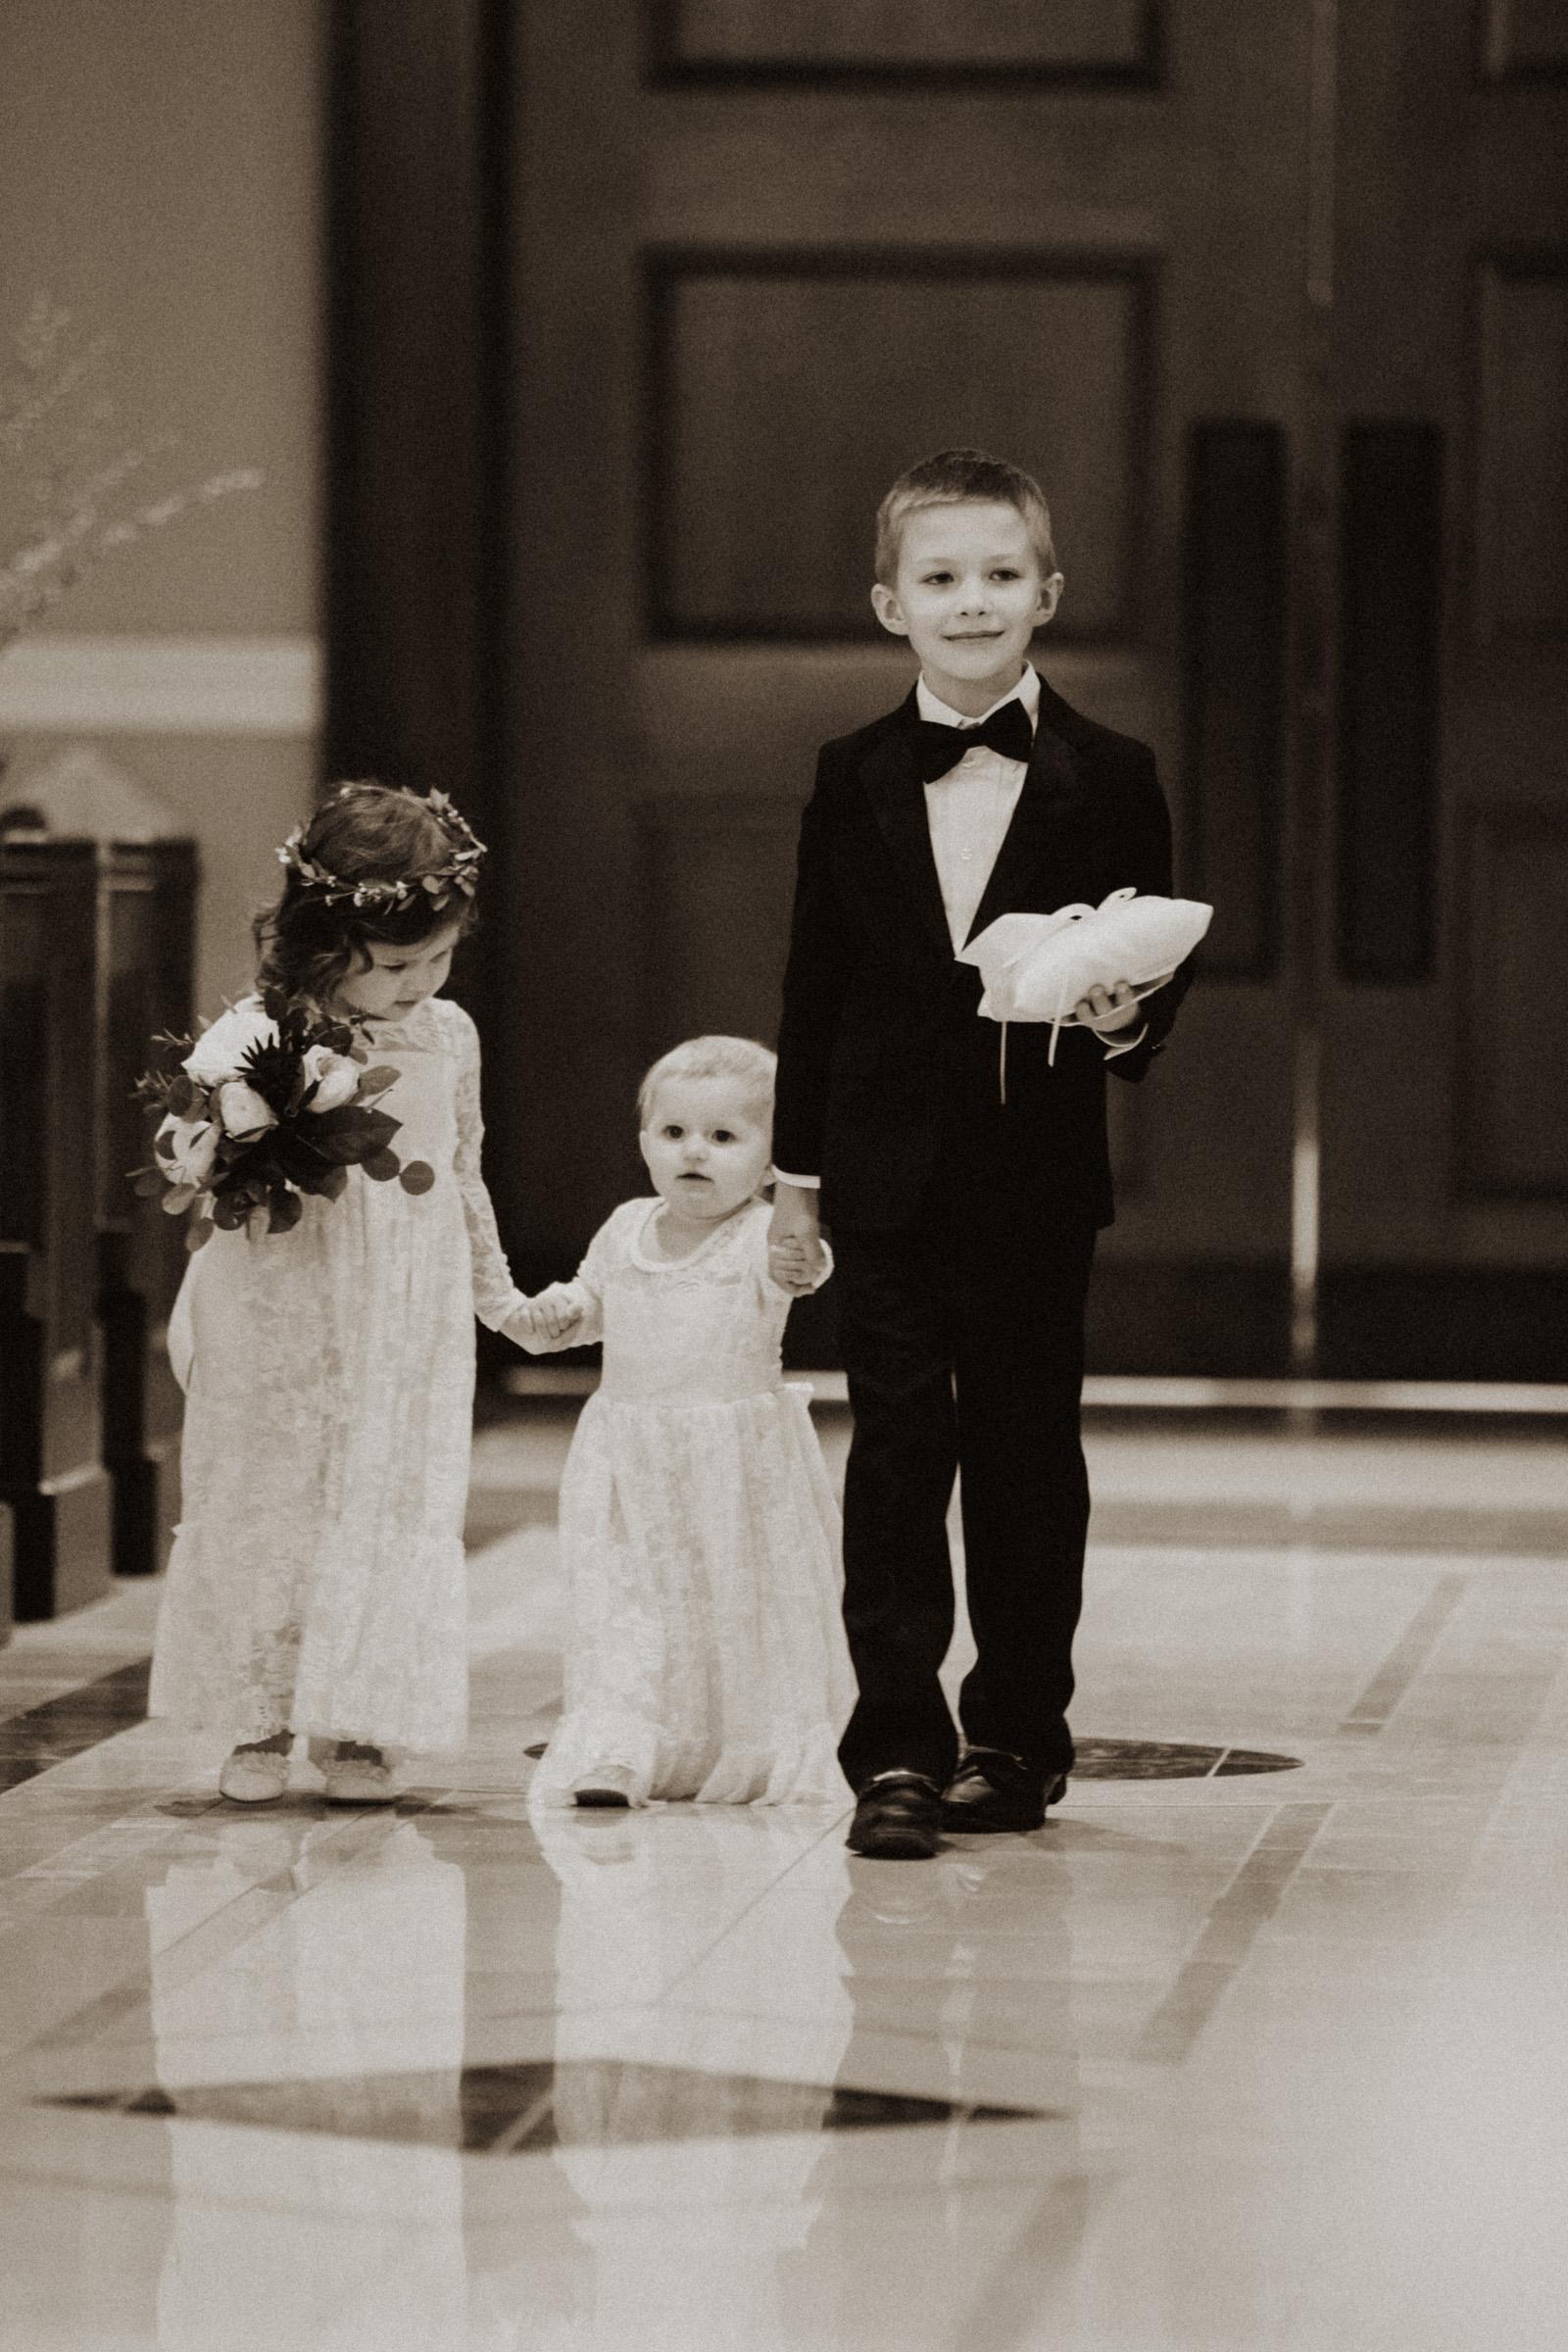 alyssa barletter photography shawnee mission park winter wedding 8th and main grandview missouri photographer-44.jpg